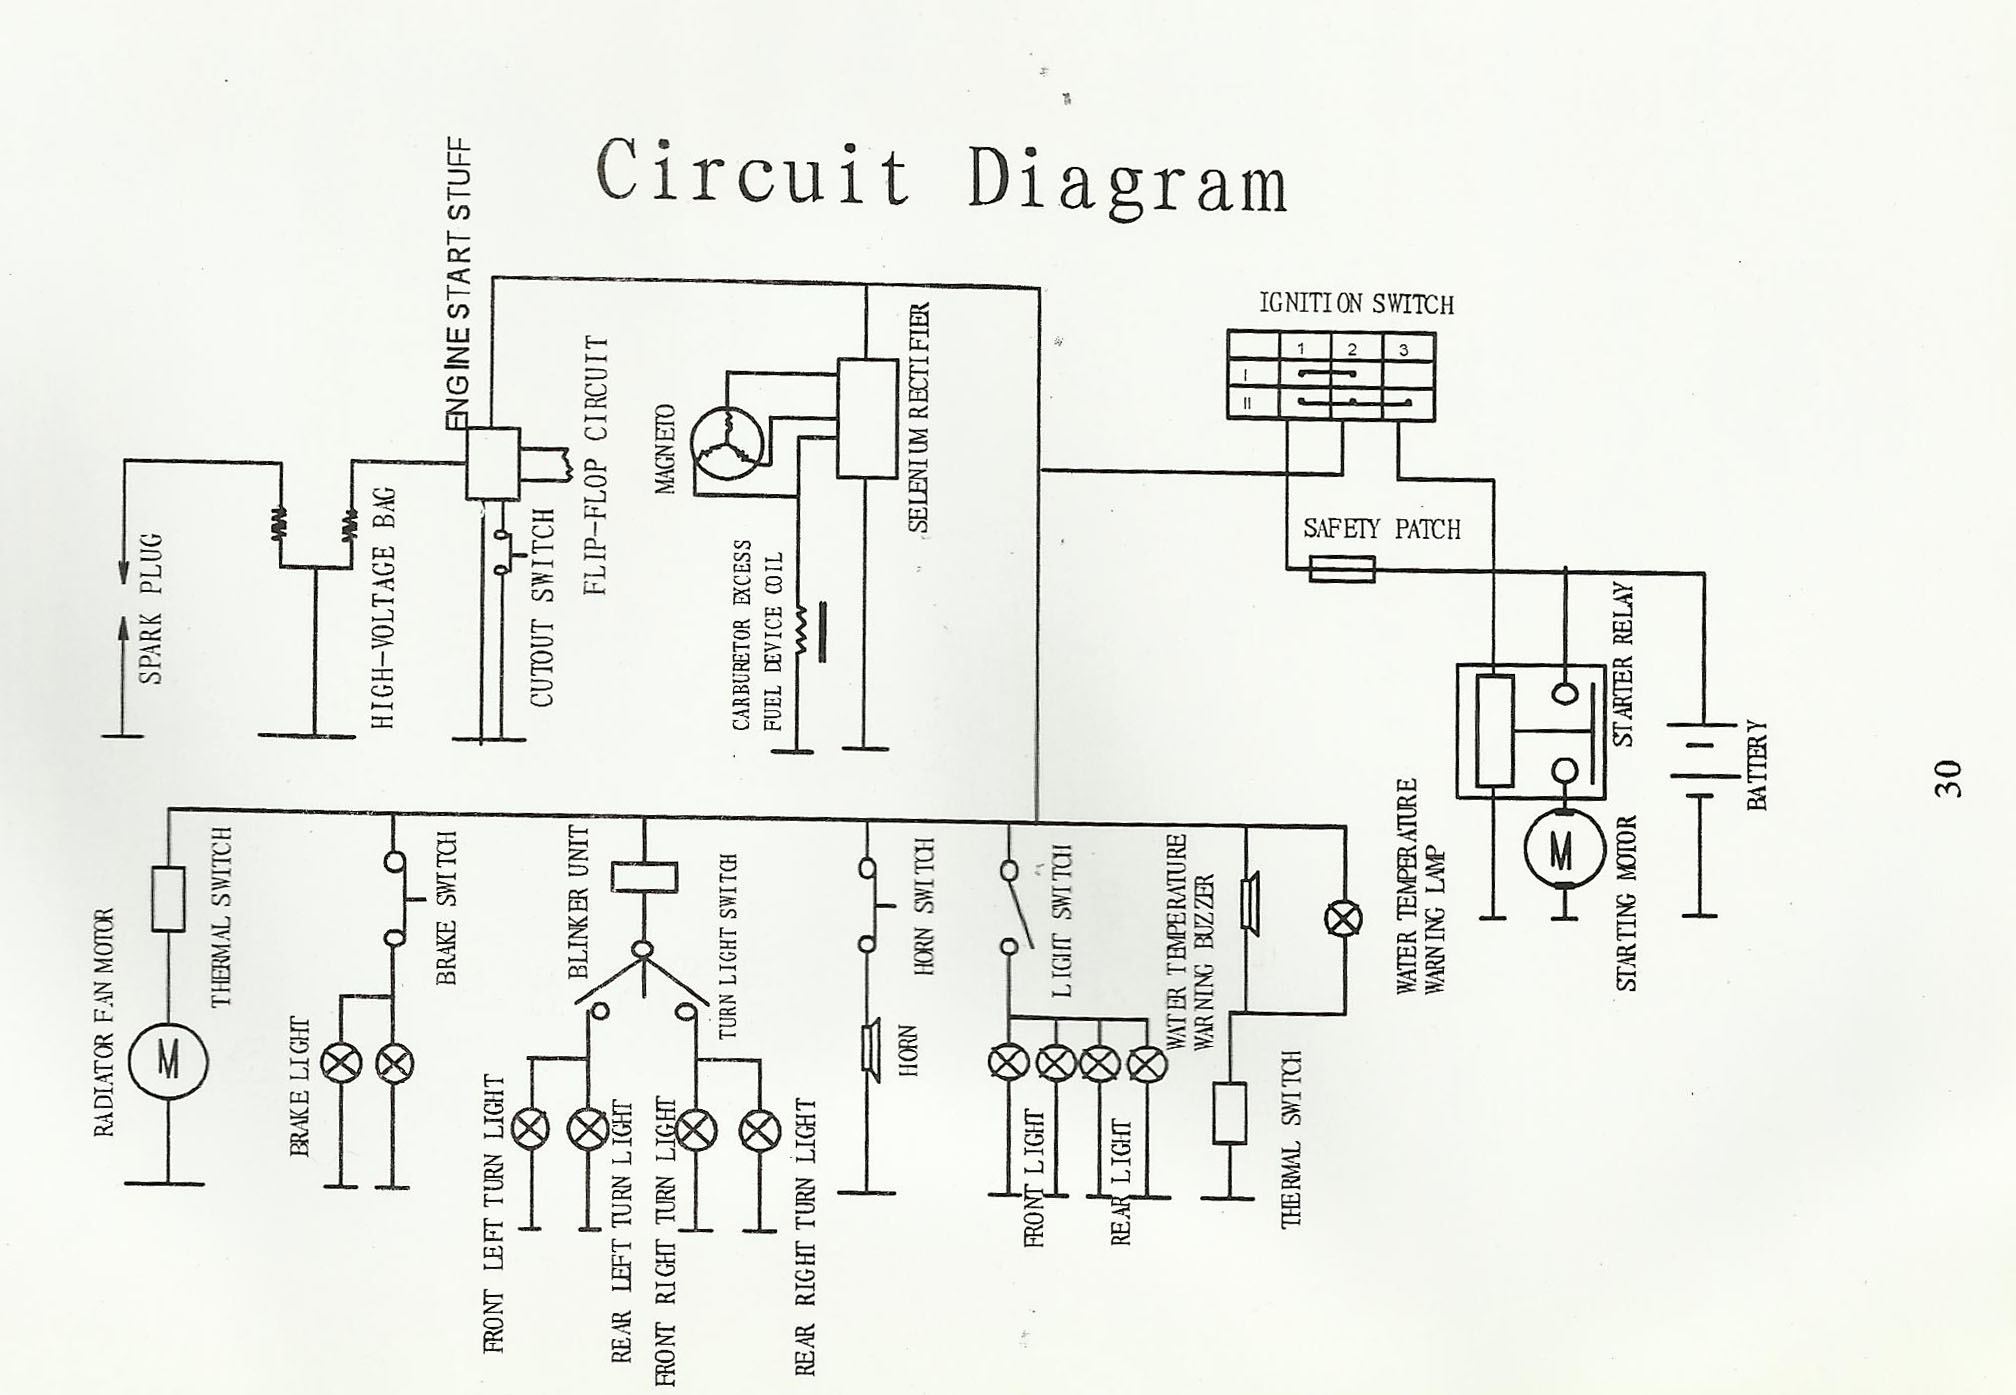 kandi 150cc engine wiring diagram kandi 110cc atv wiring diagram lair anb18 vmbso de  kandi 110cc atv wiring diagram lair